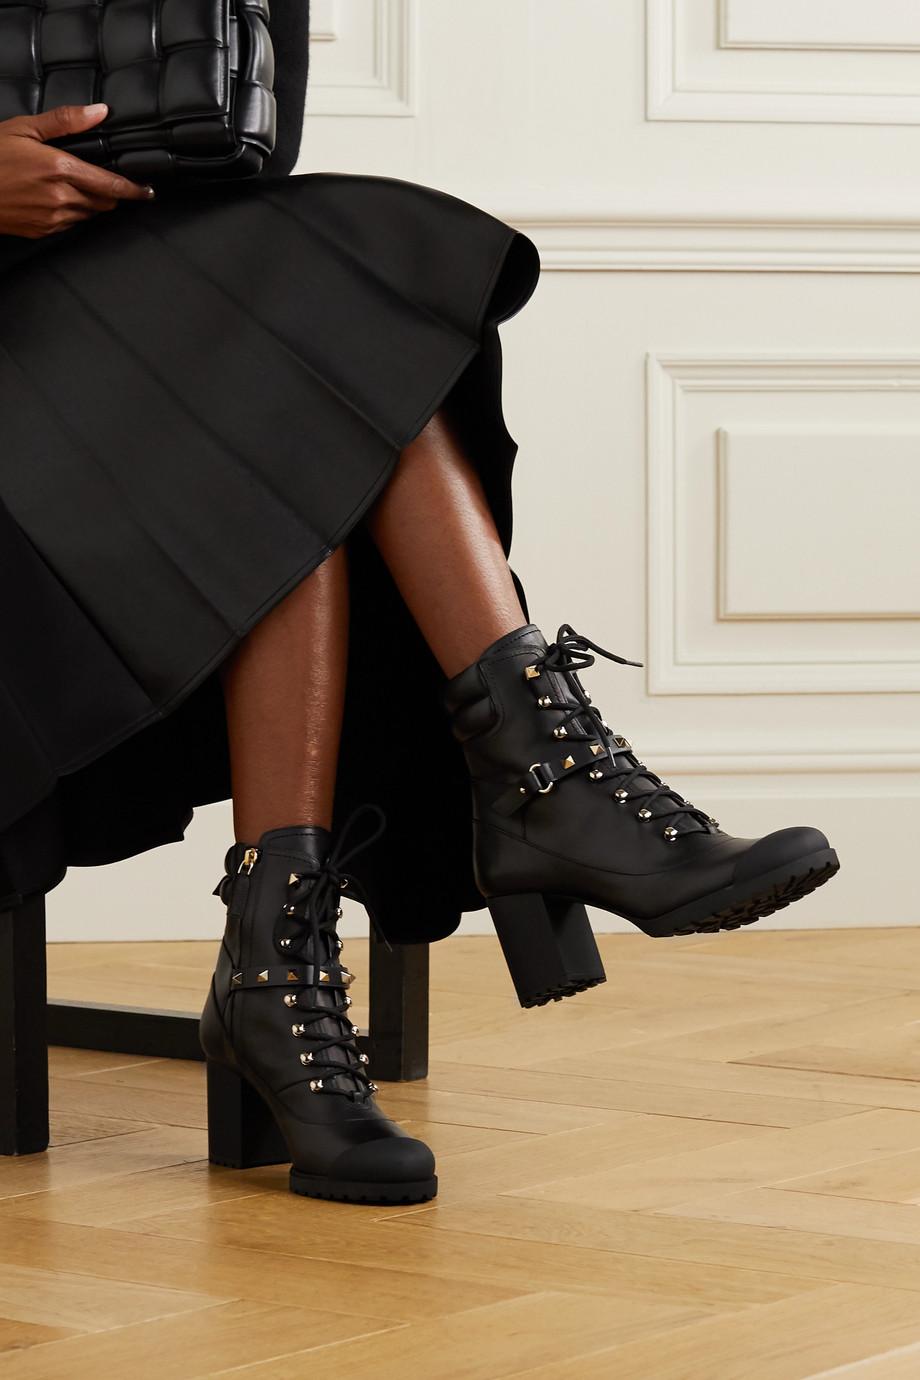 Valentino Valentino Garavani Rockstud 95 leather ankle boots